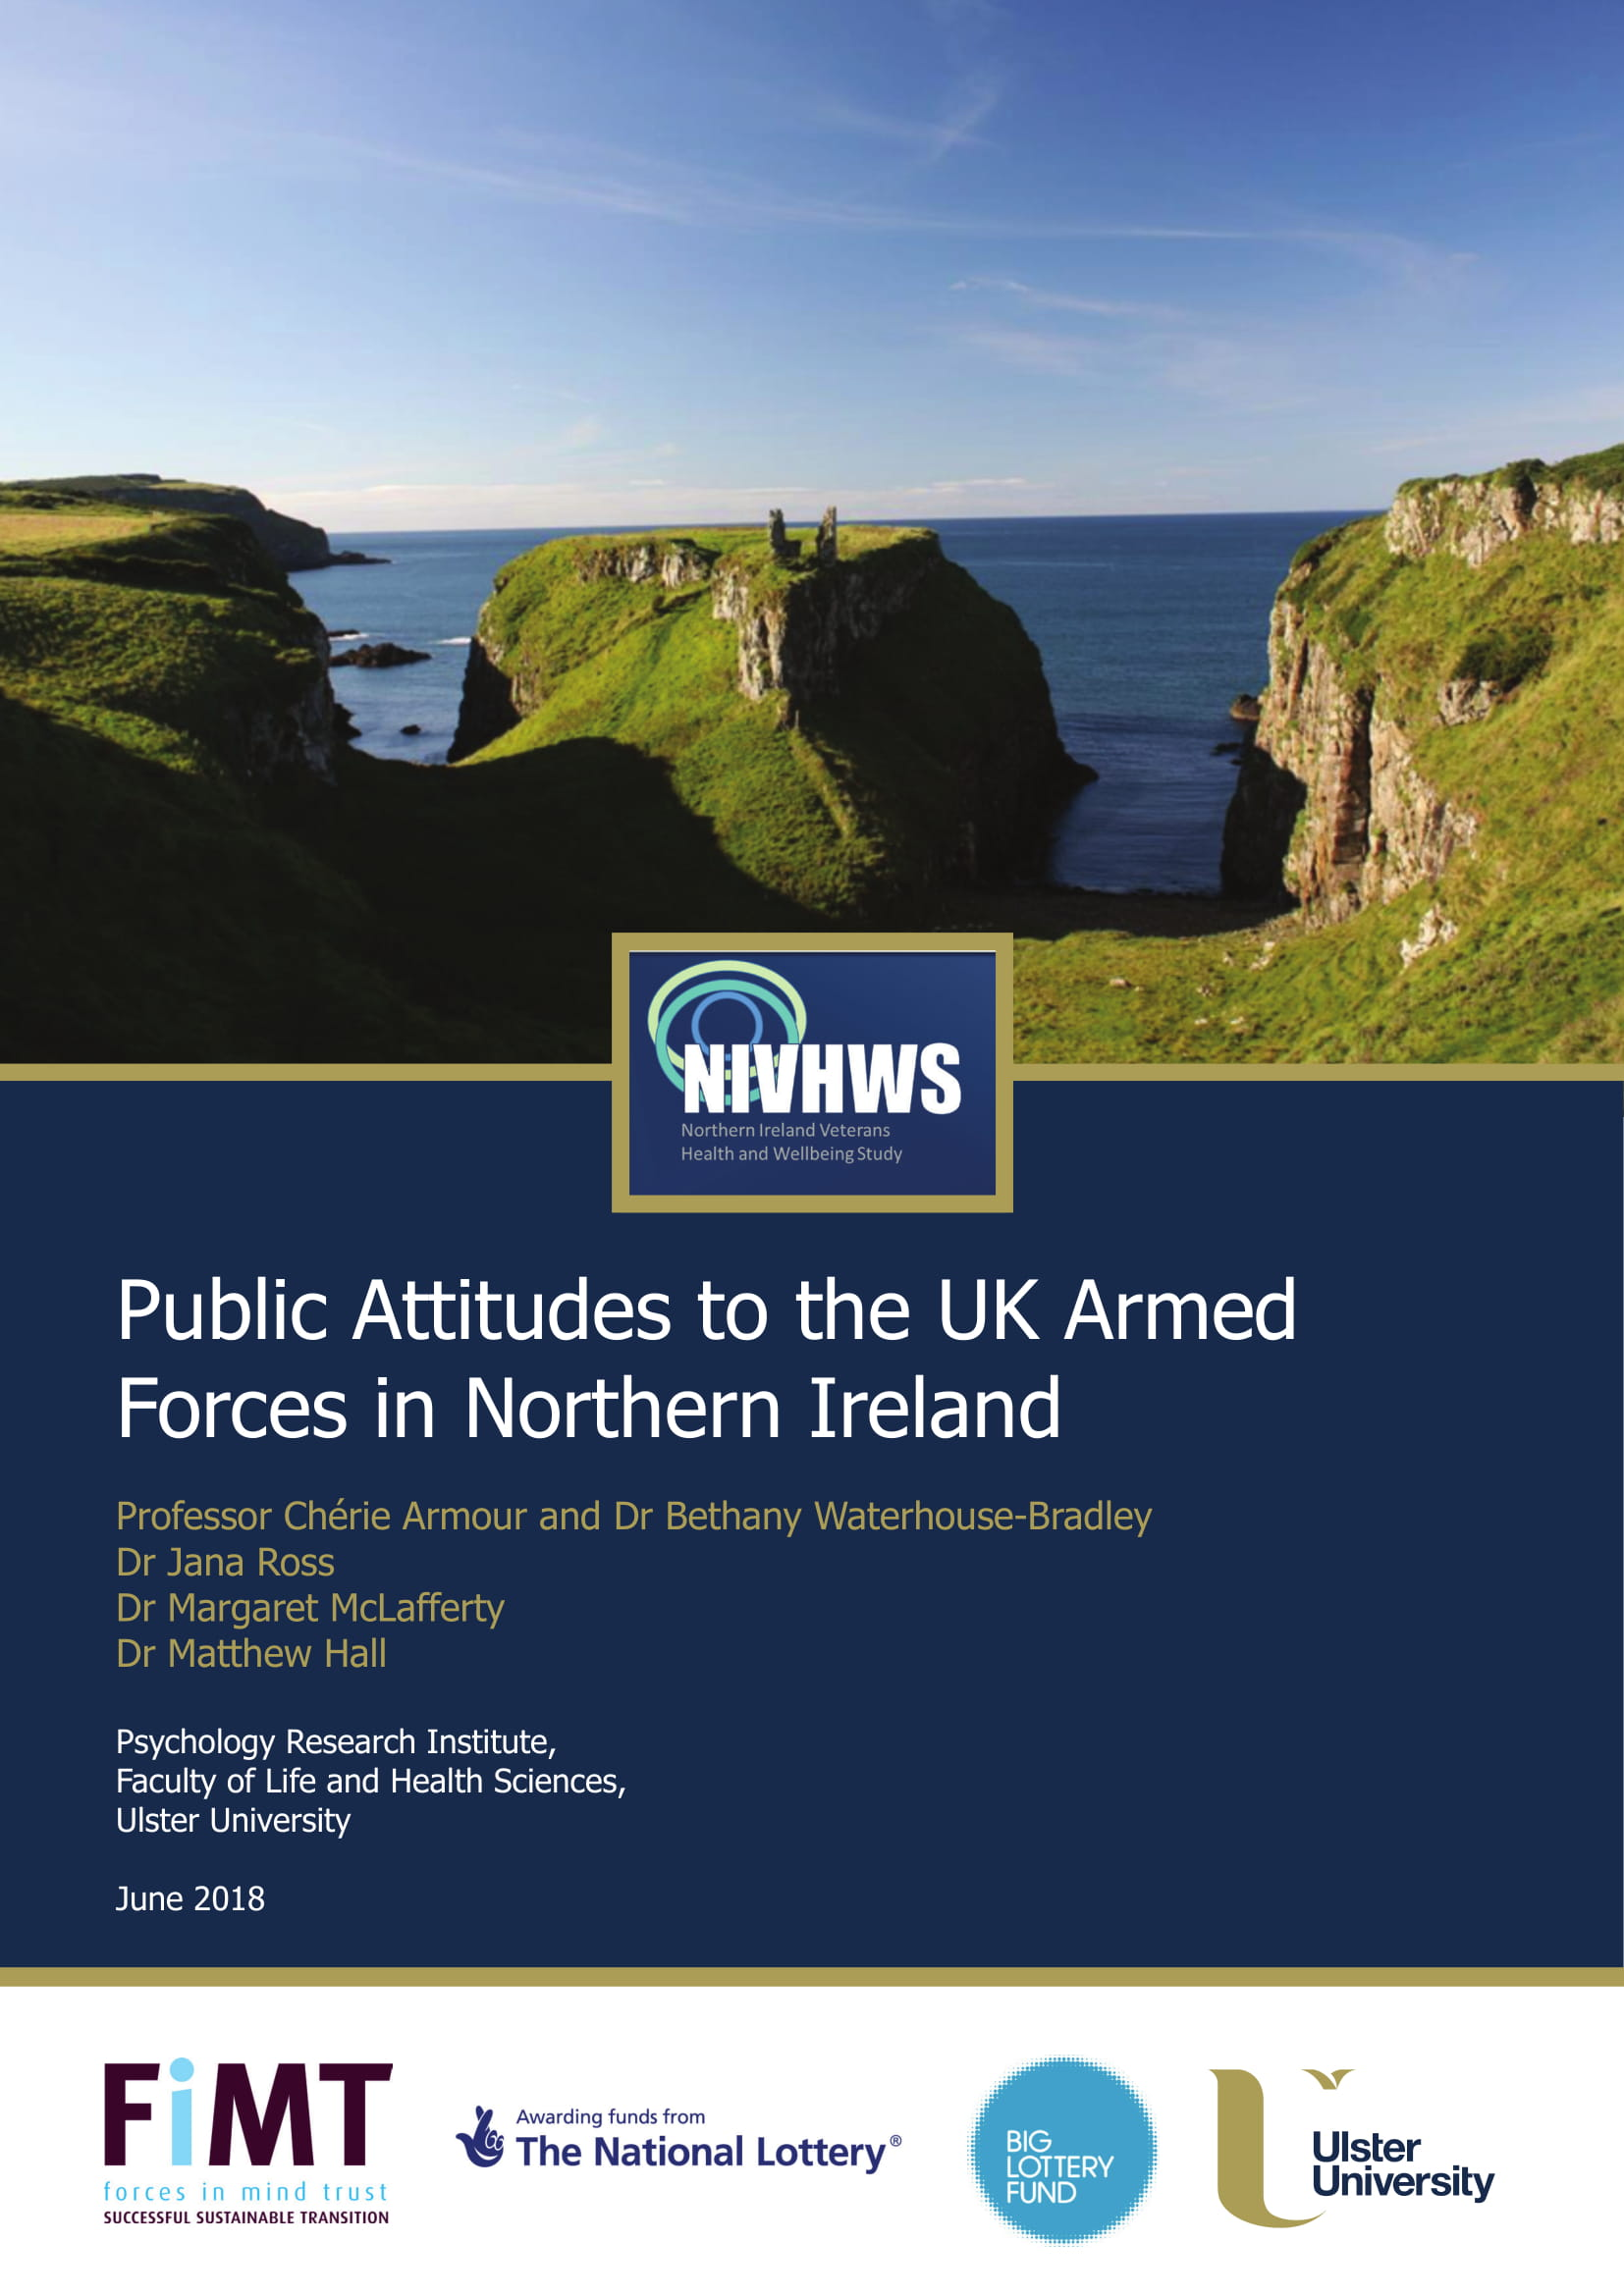 Public Attitudes Report Cover